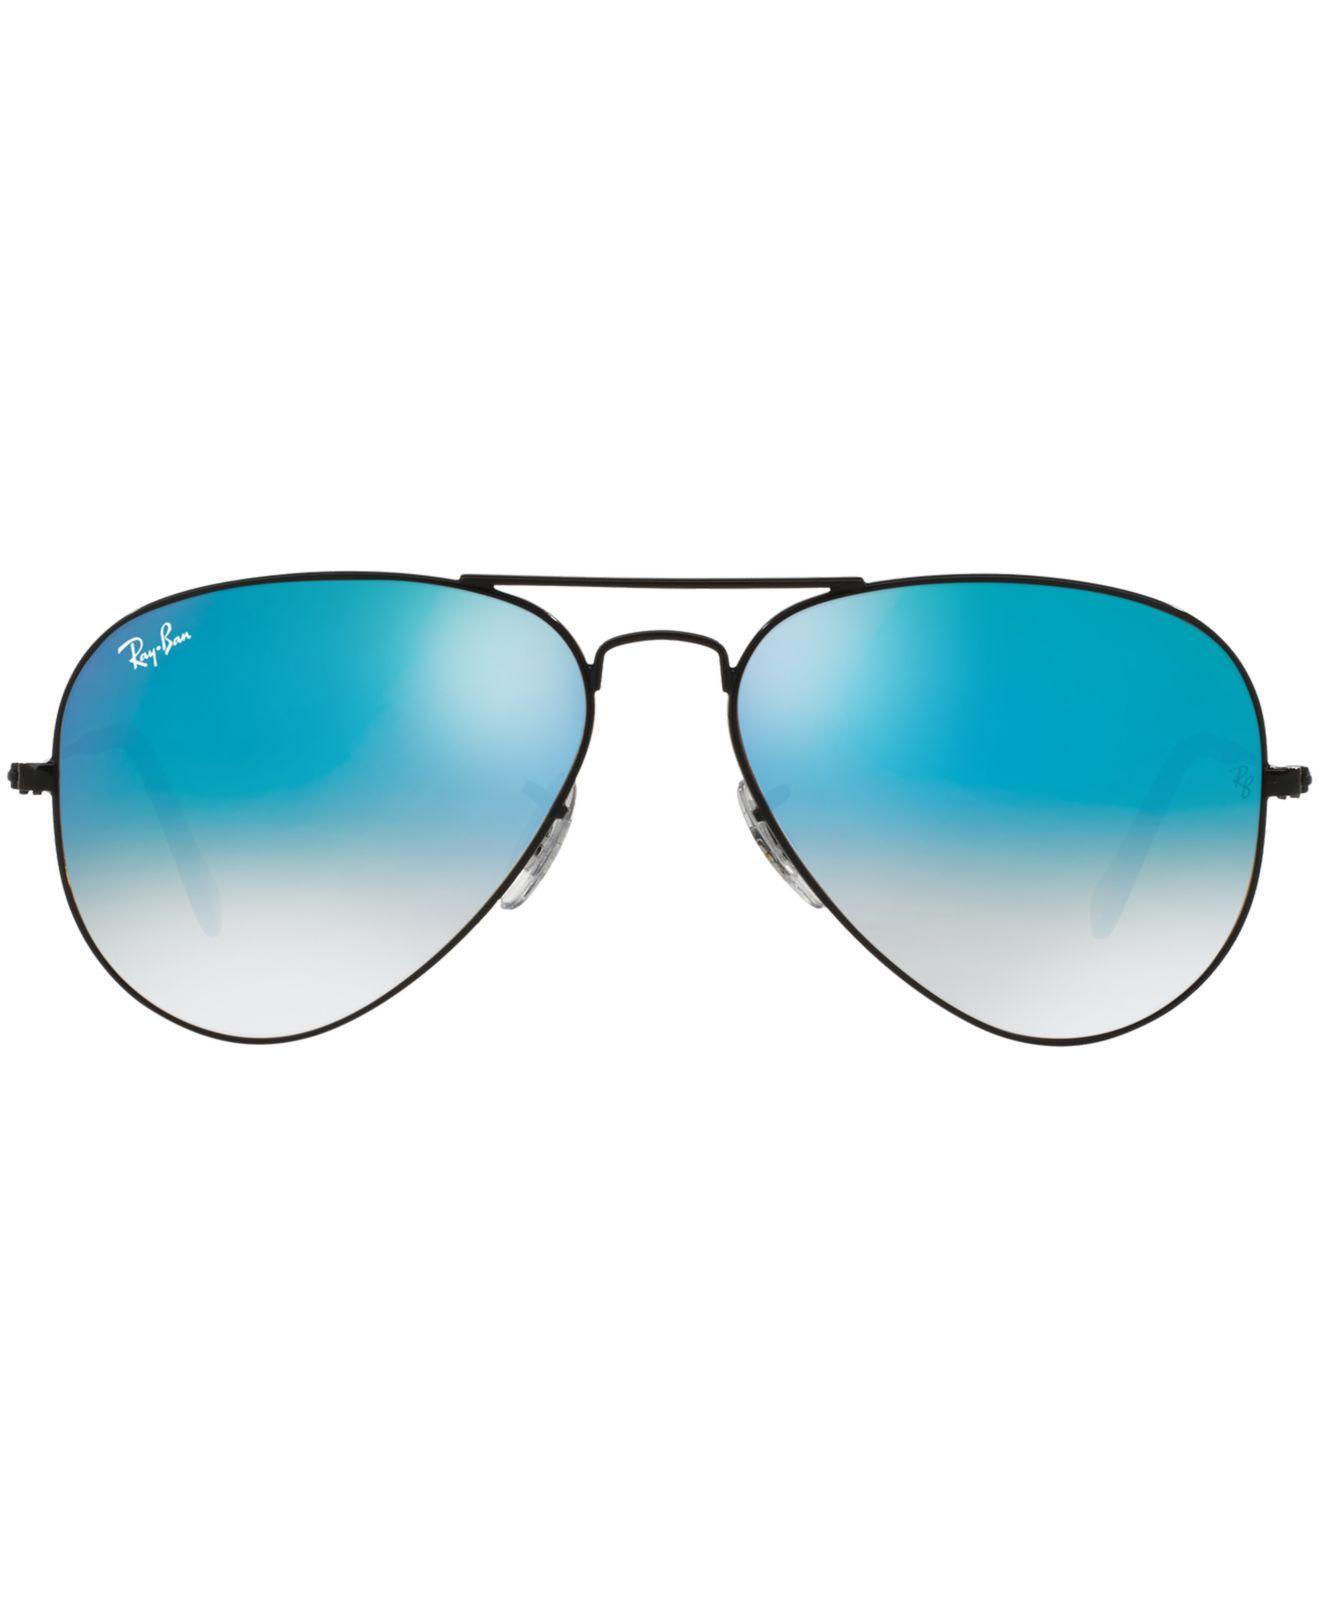 a6e139007333a Lyst - Ray-Ban Sunglasses